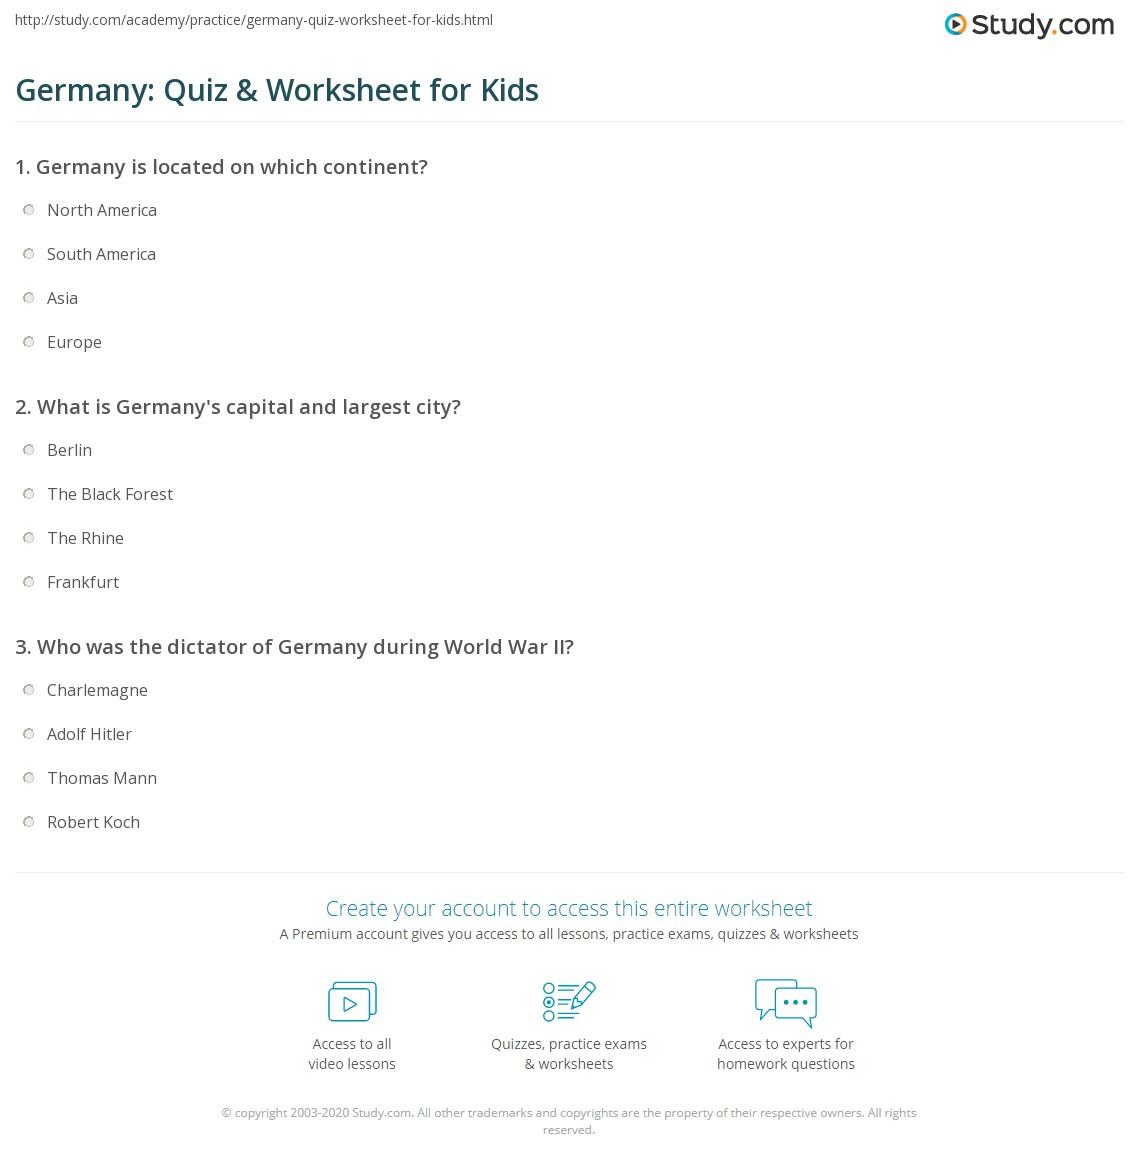 Germany Quiz & Worksheet for Kids   Study.com